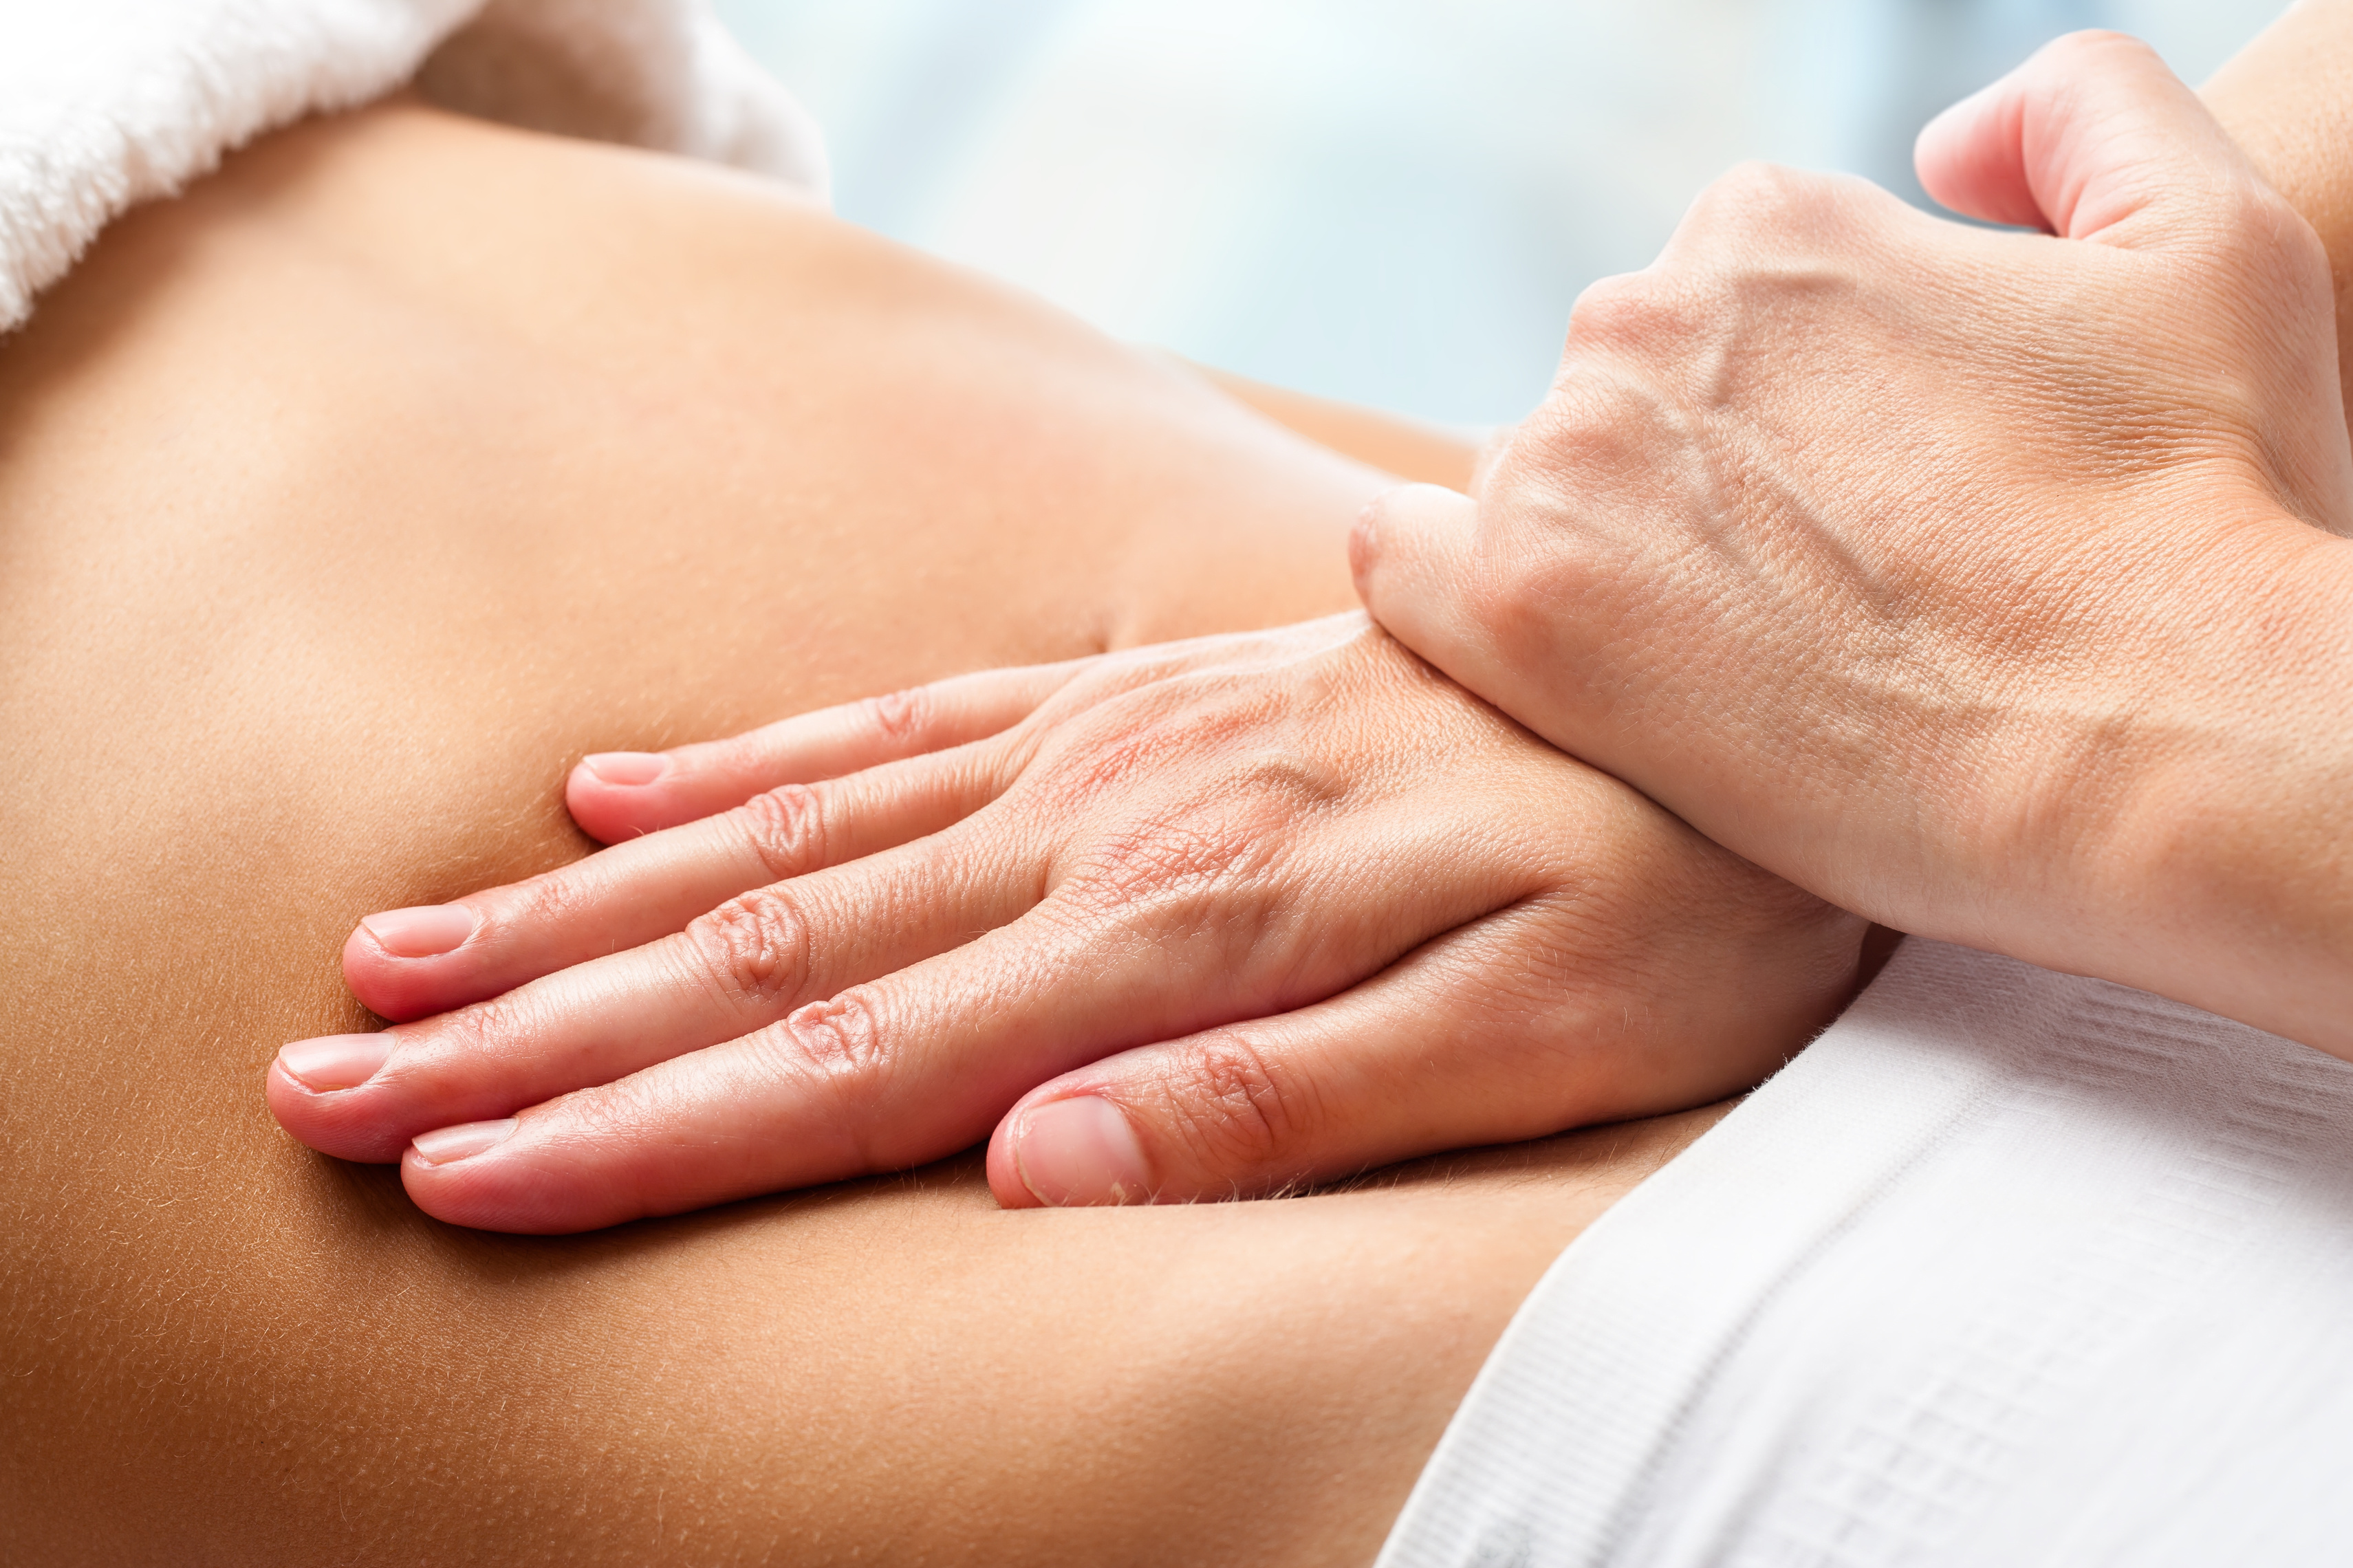 mobile massagen in m nchen und k ln positive effekte. Black Bedroom Furniture Sets. Home Design Ideas